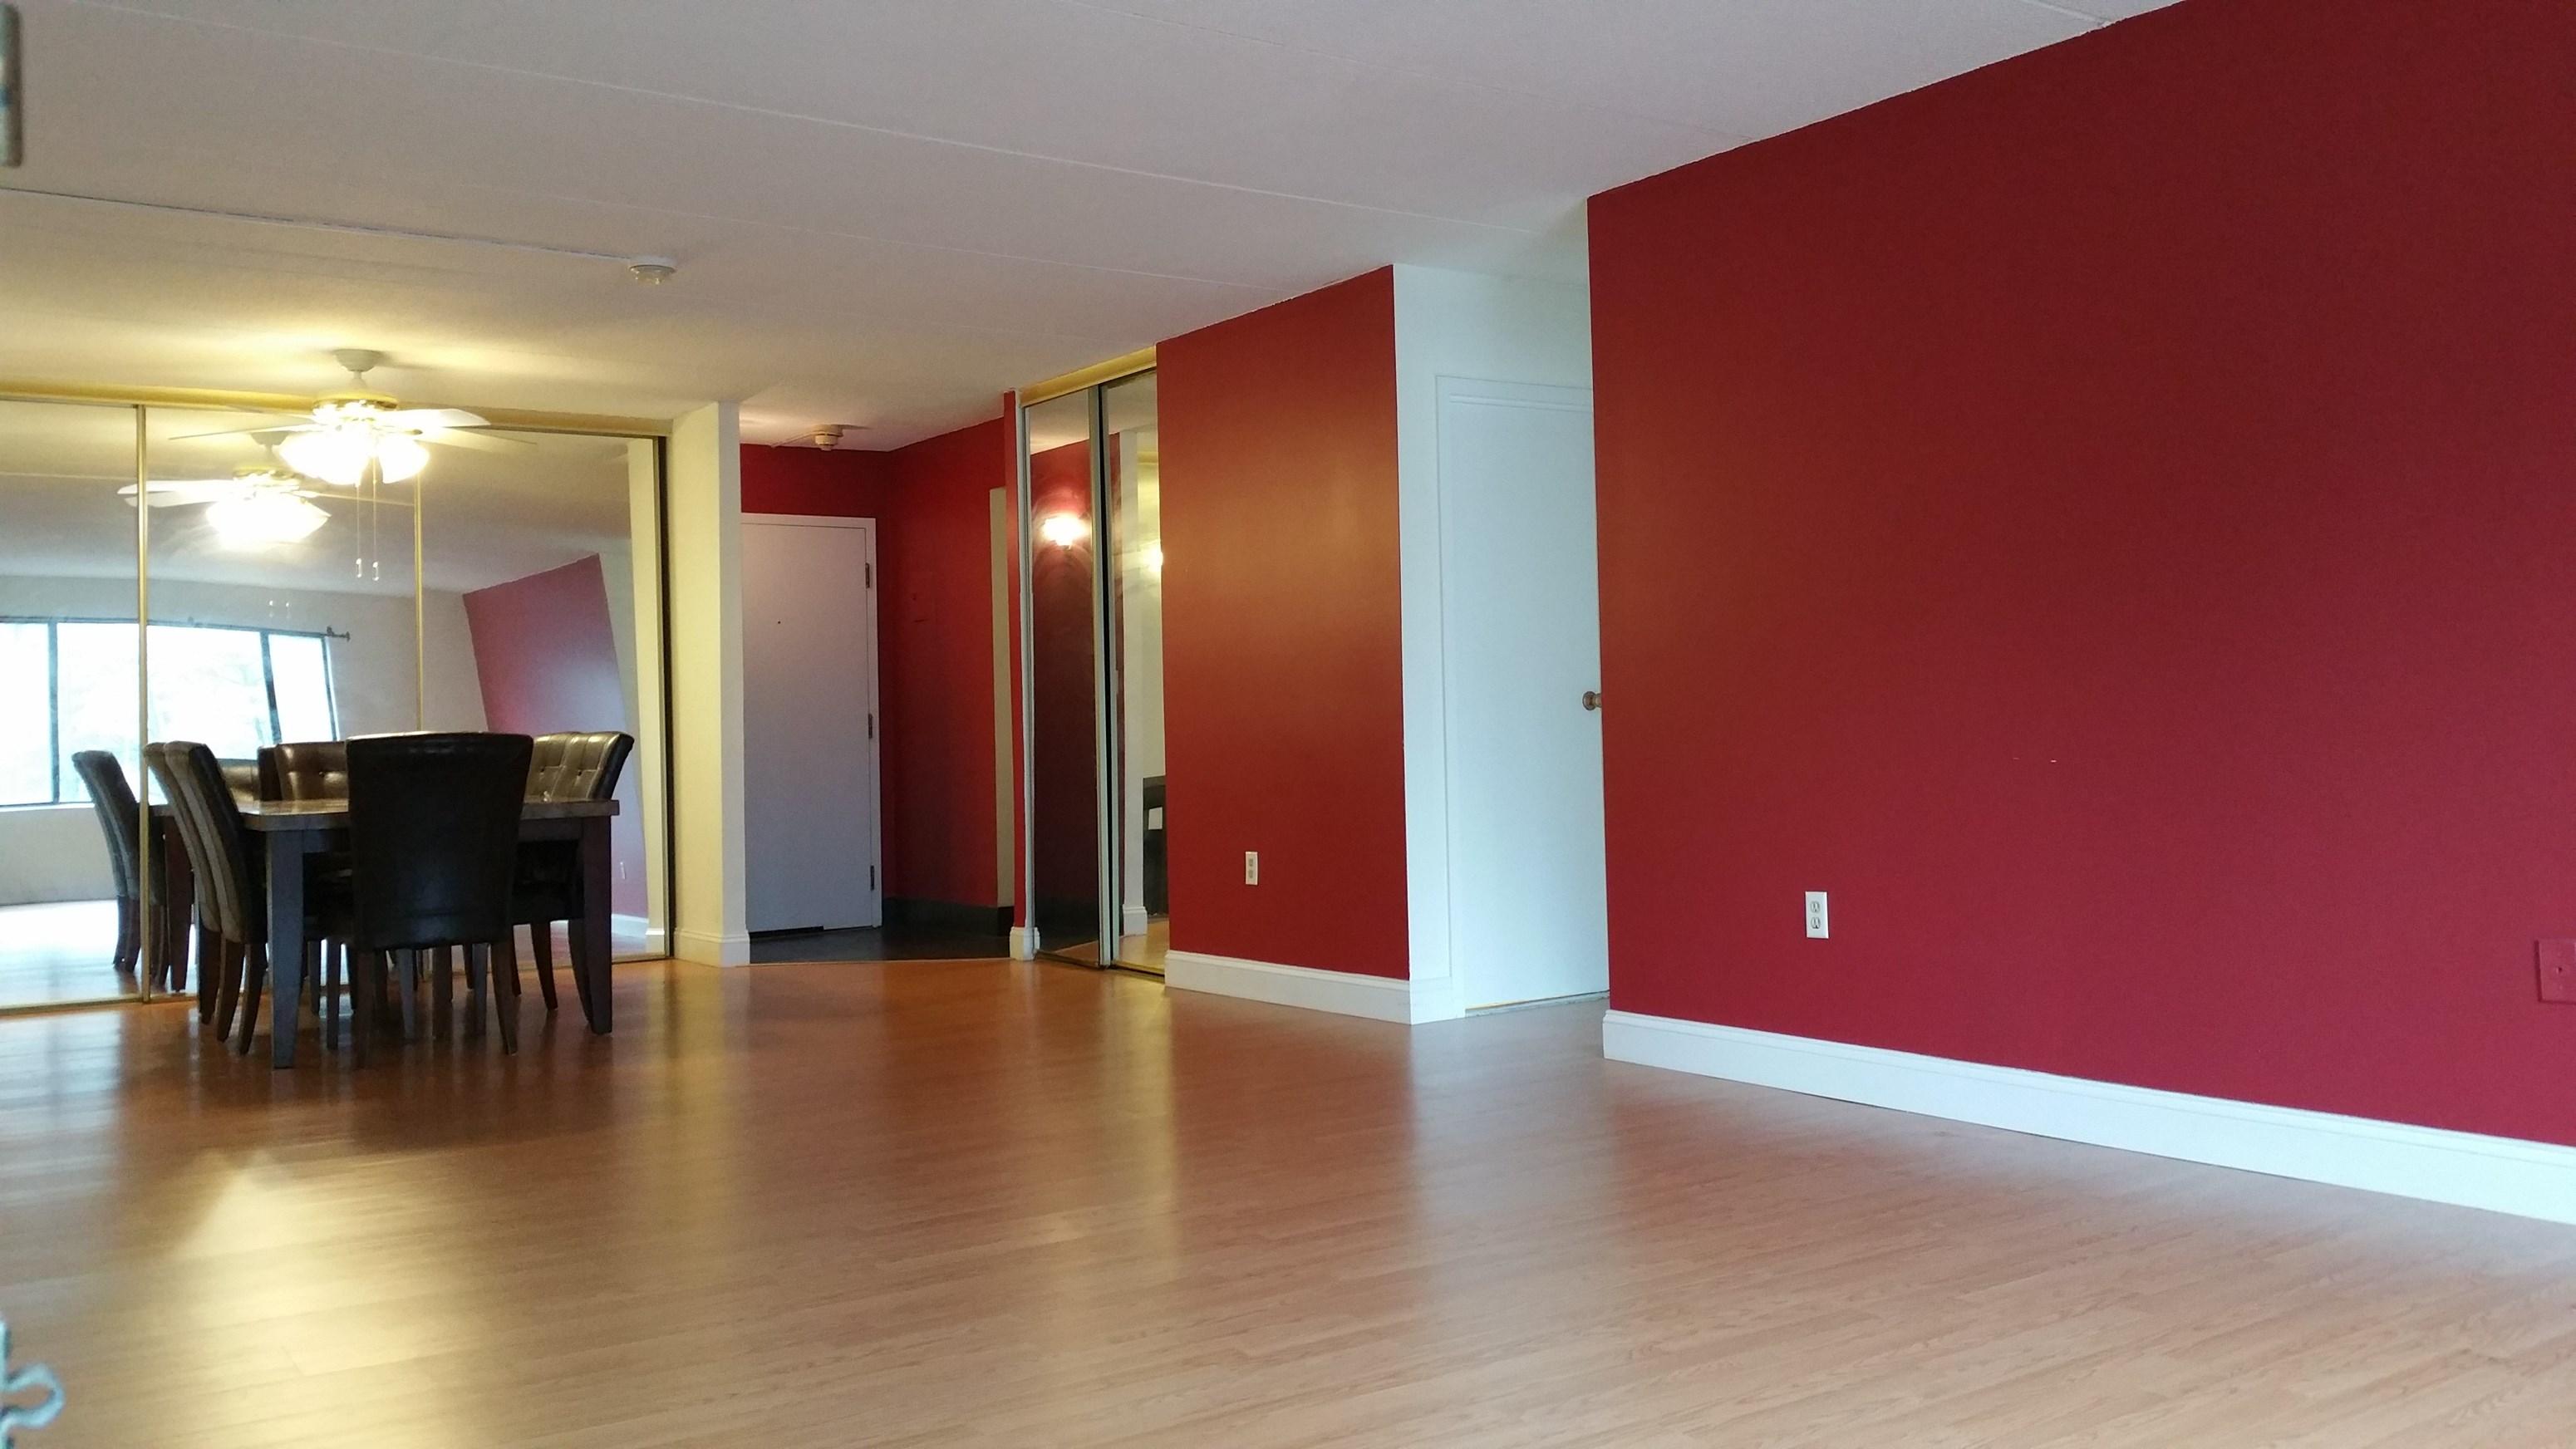 Sub-Leasing Luxury Apartment In Medford | 2 BHK in Medford, MA ...